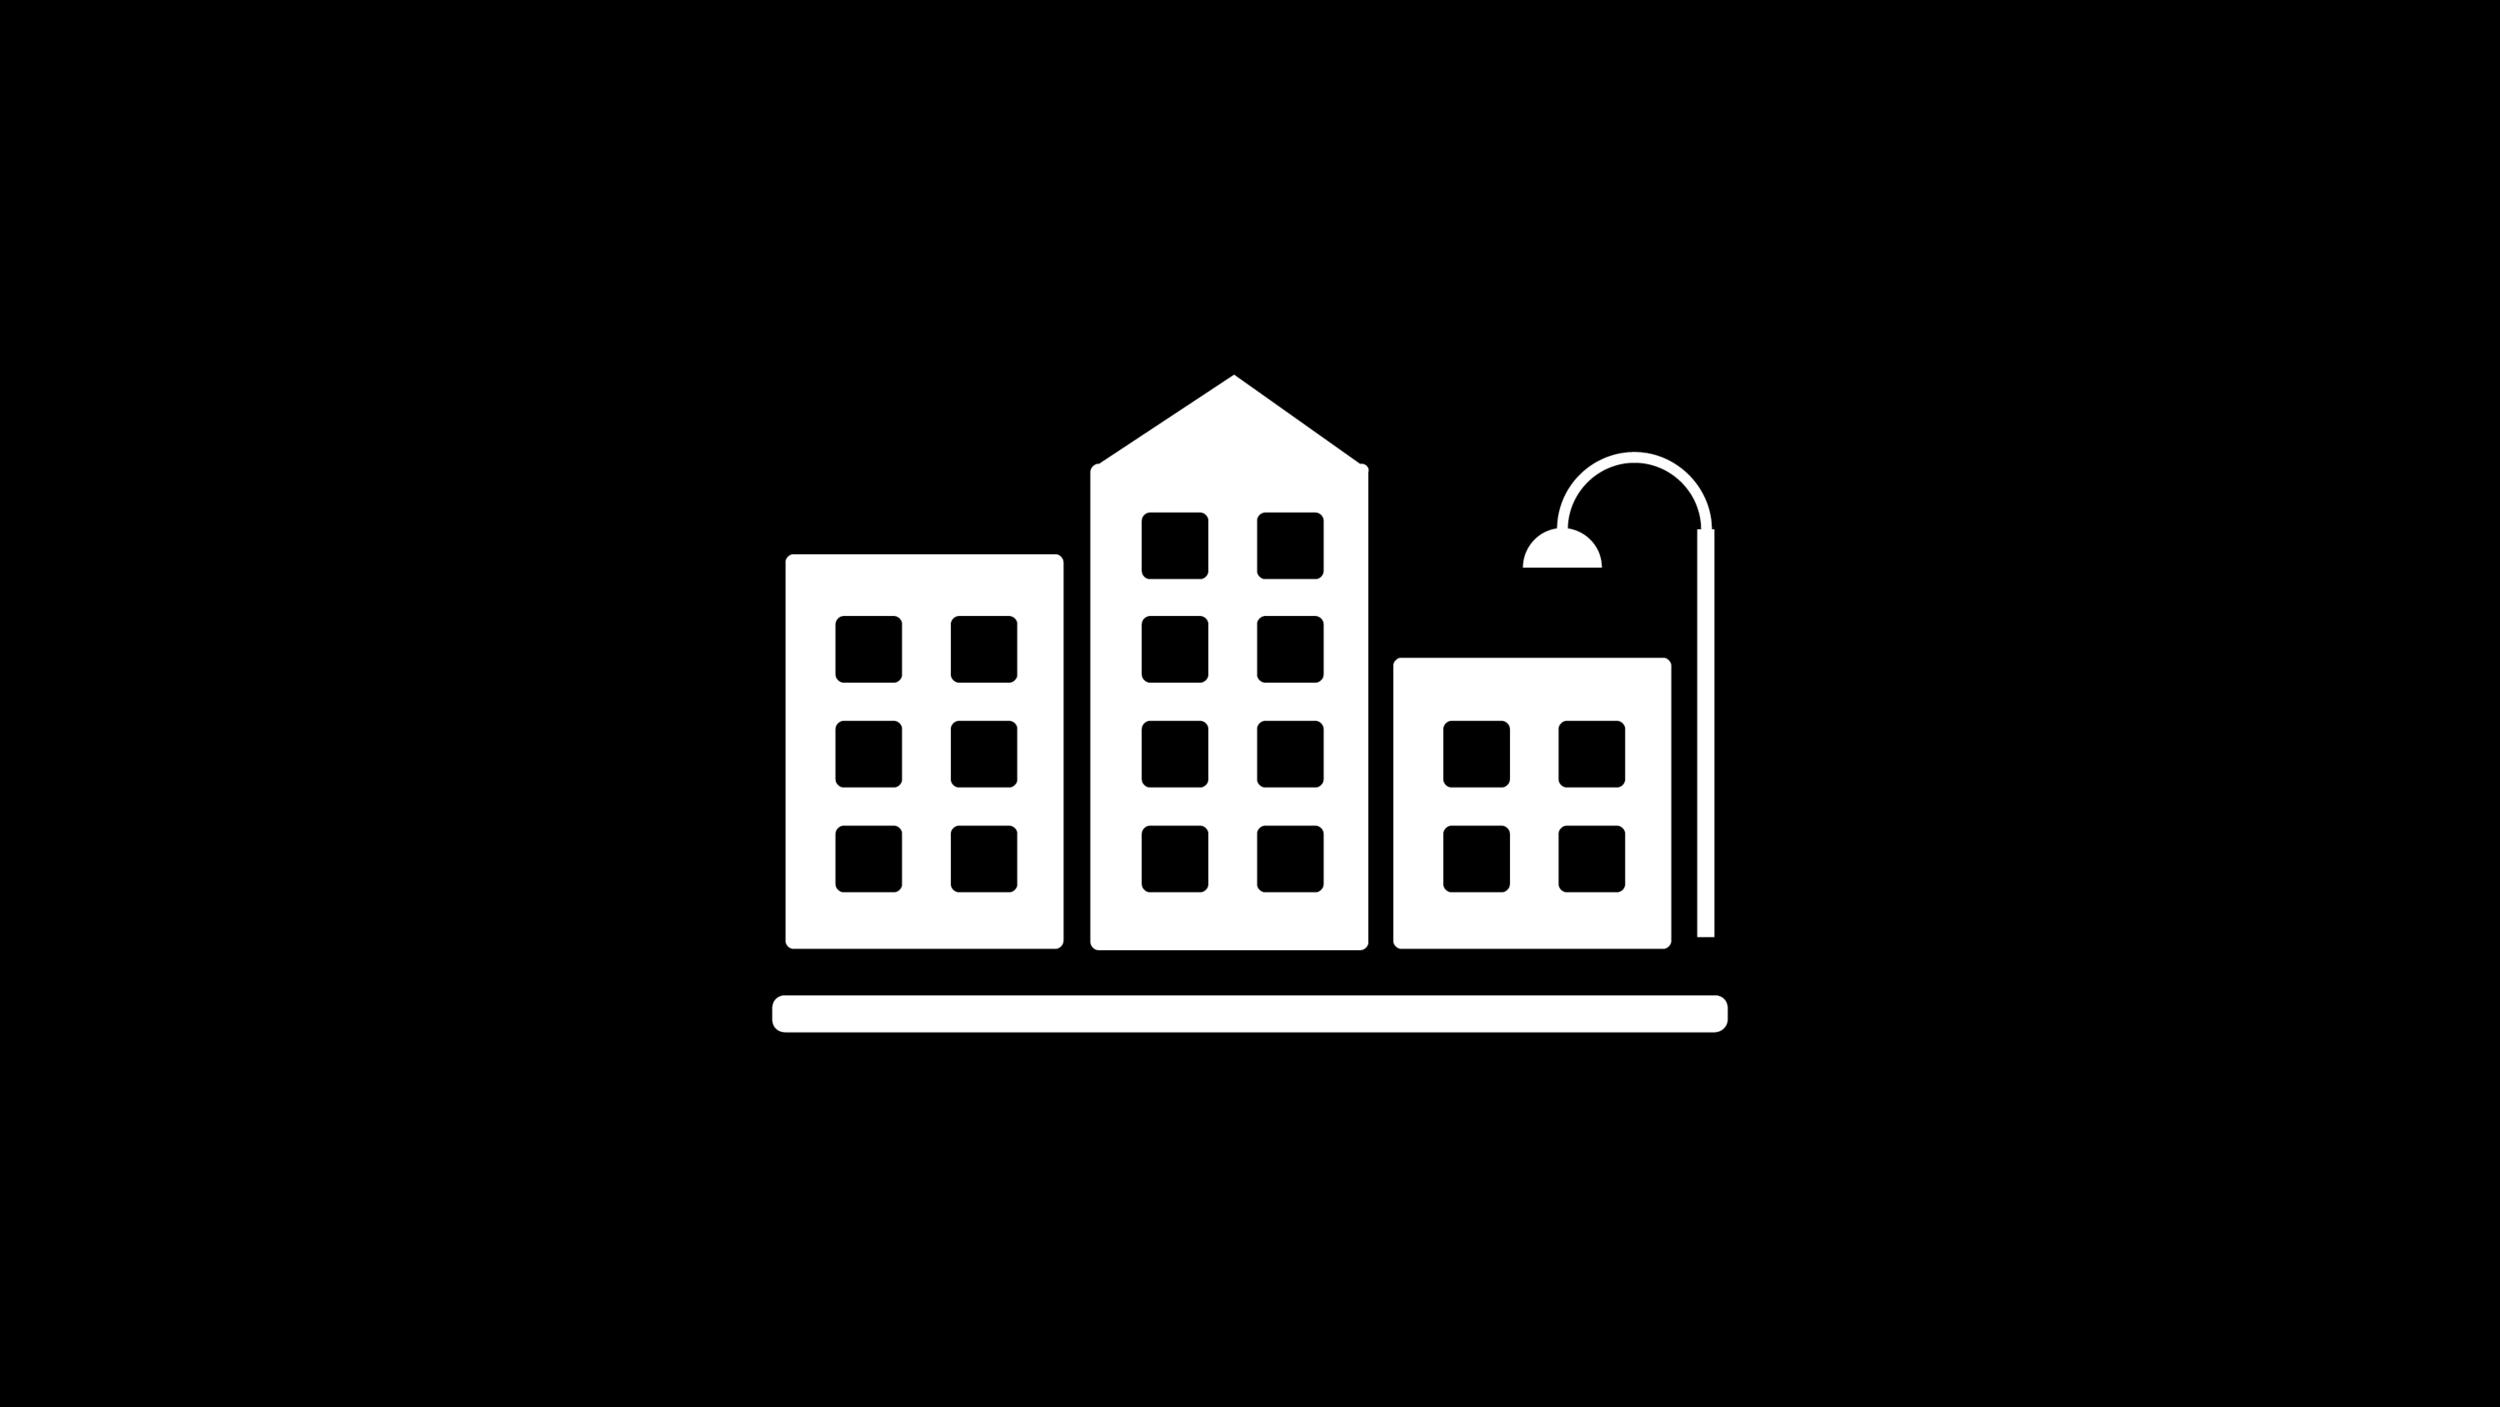 Logo palette expansions by Jordan H. Manigo